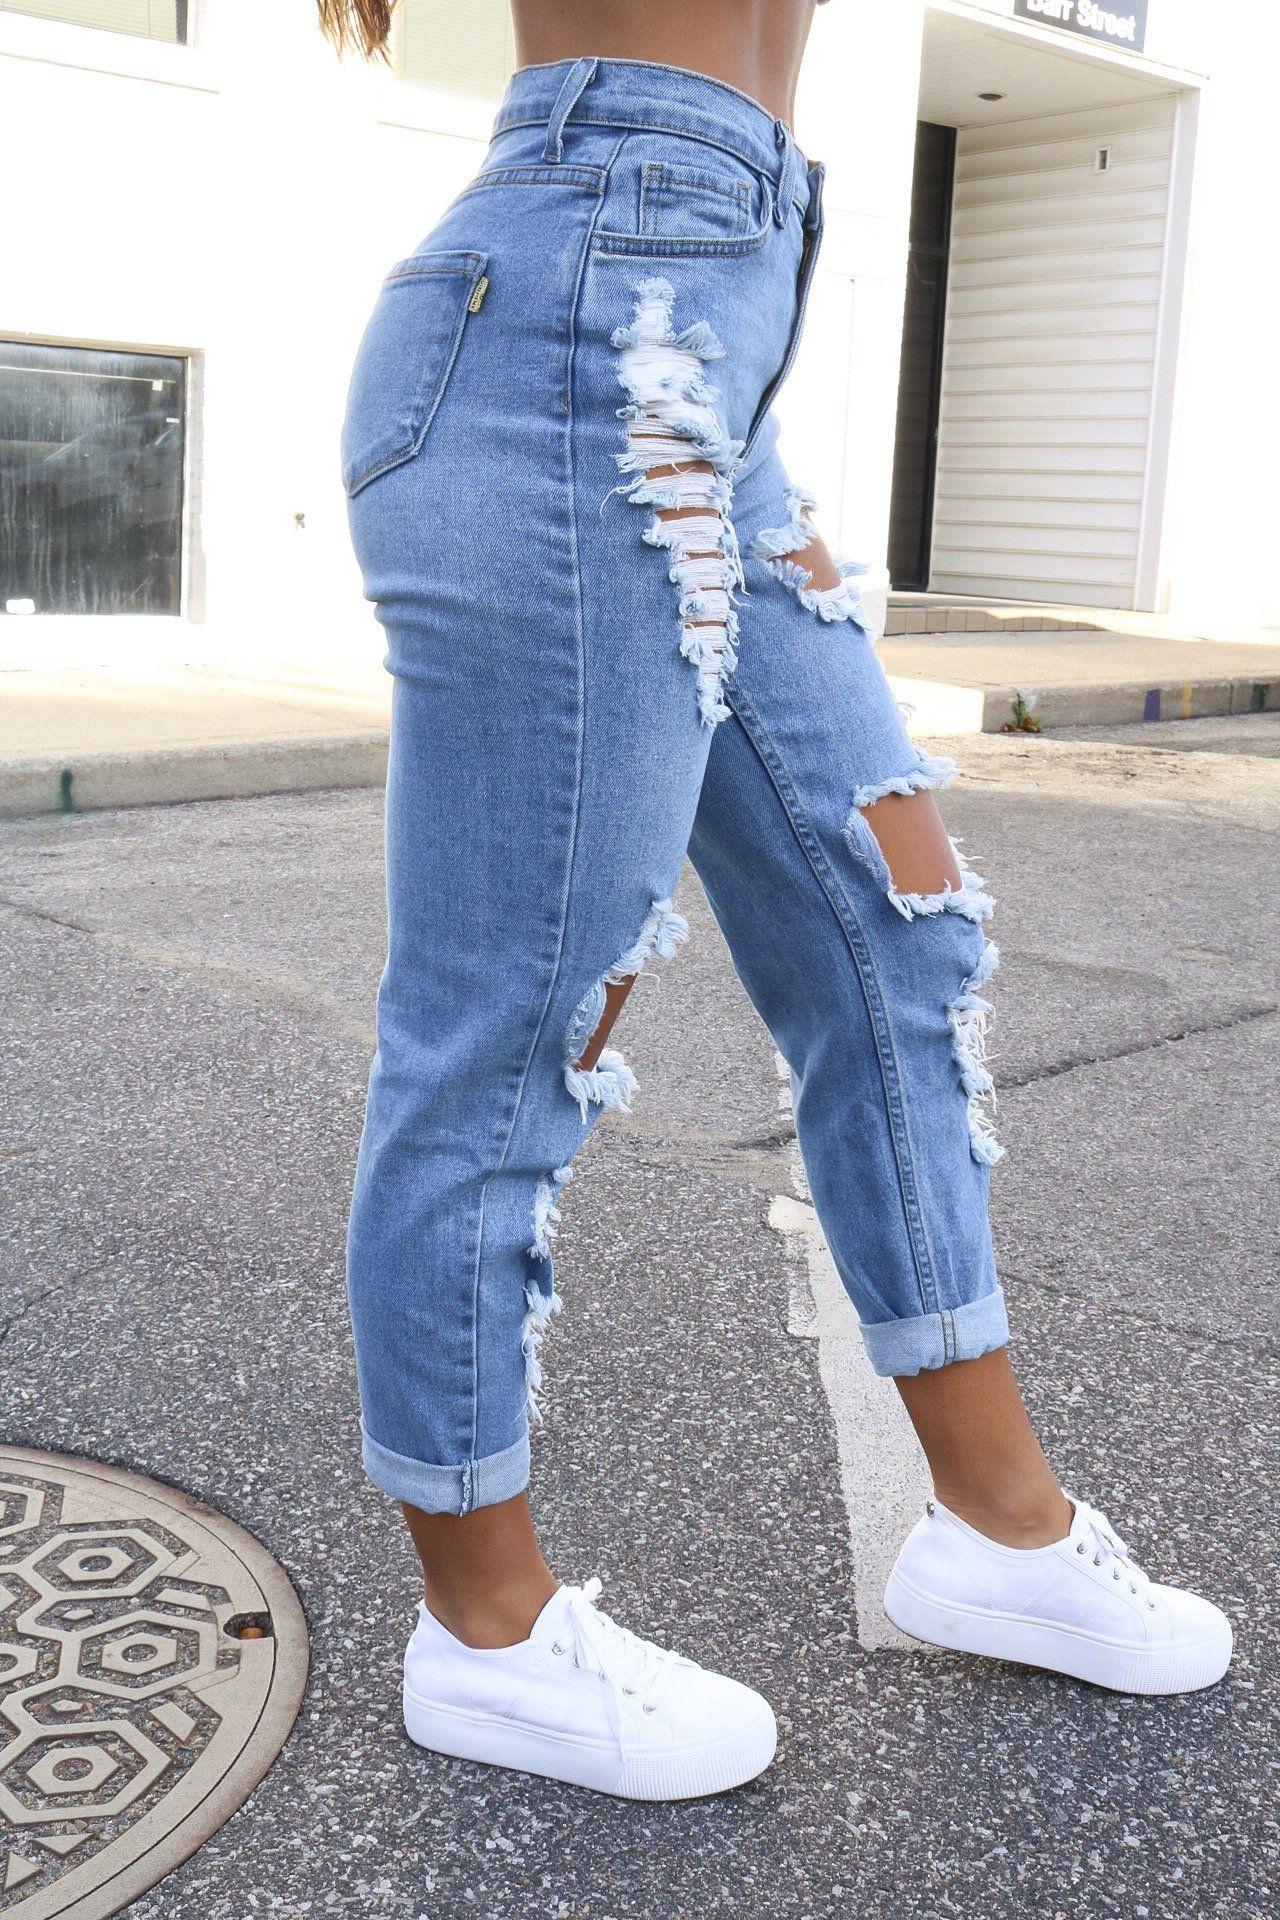 Valerie Vintage Denim Jeans - RESTOCK Valerie Vint